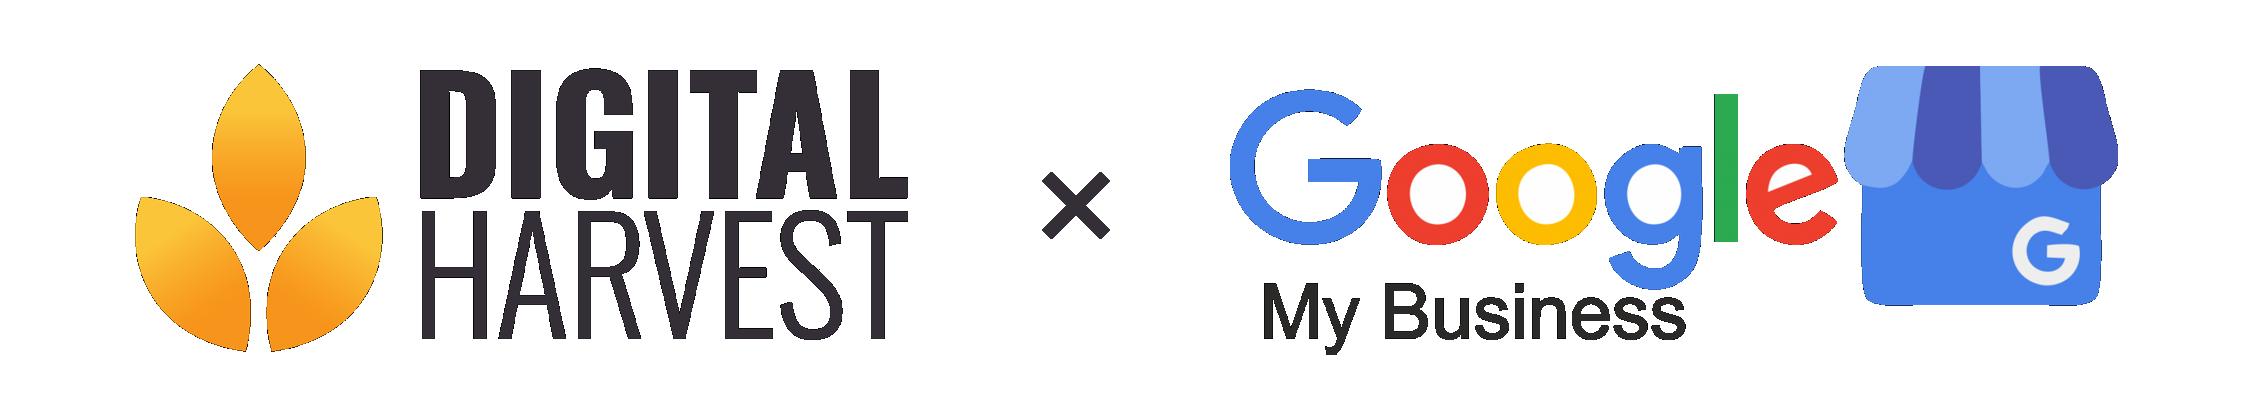 Digital-Harvest-Google-My-Business-SEO